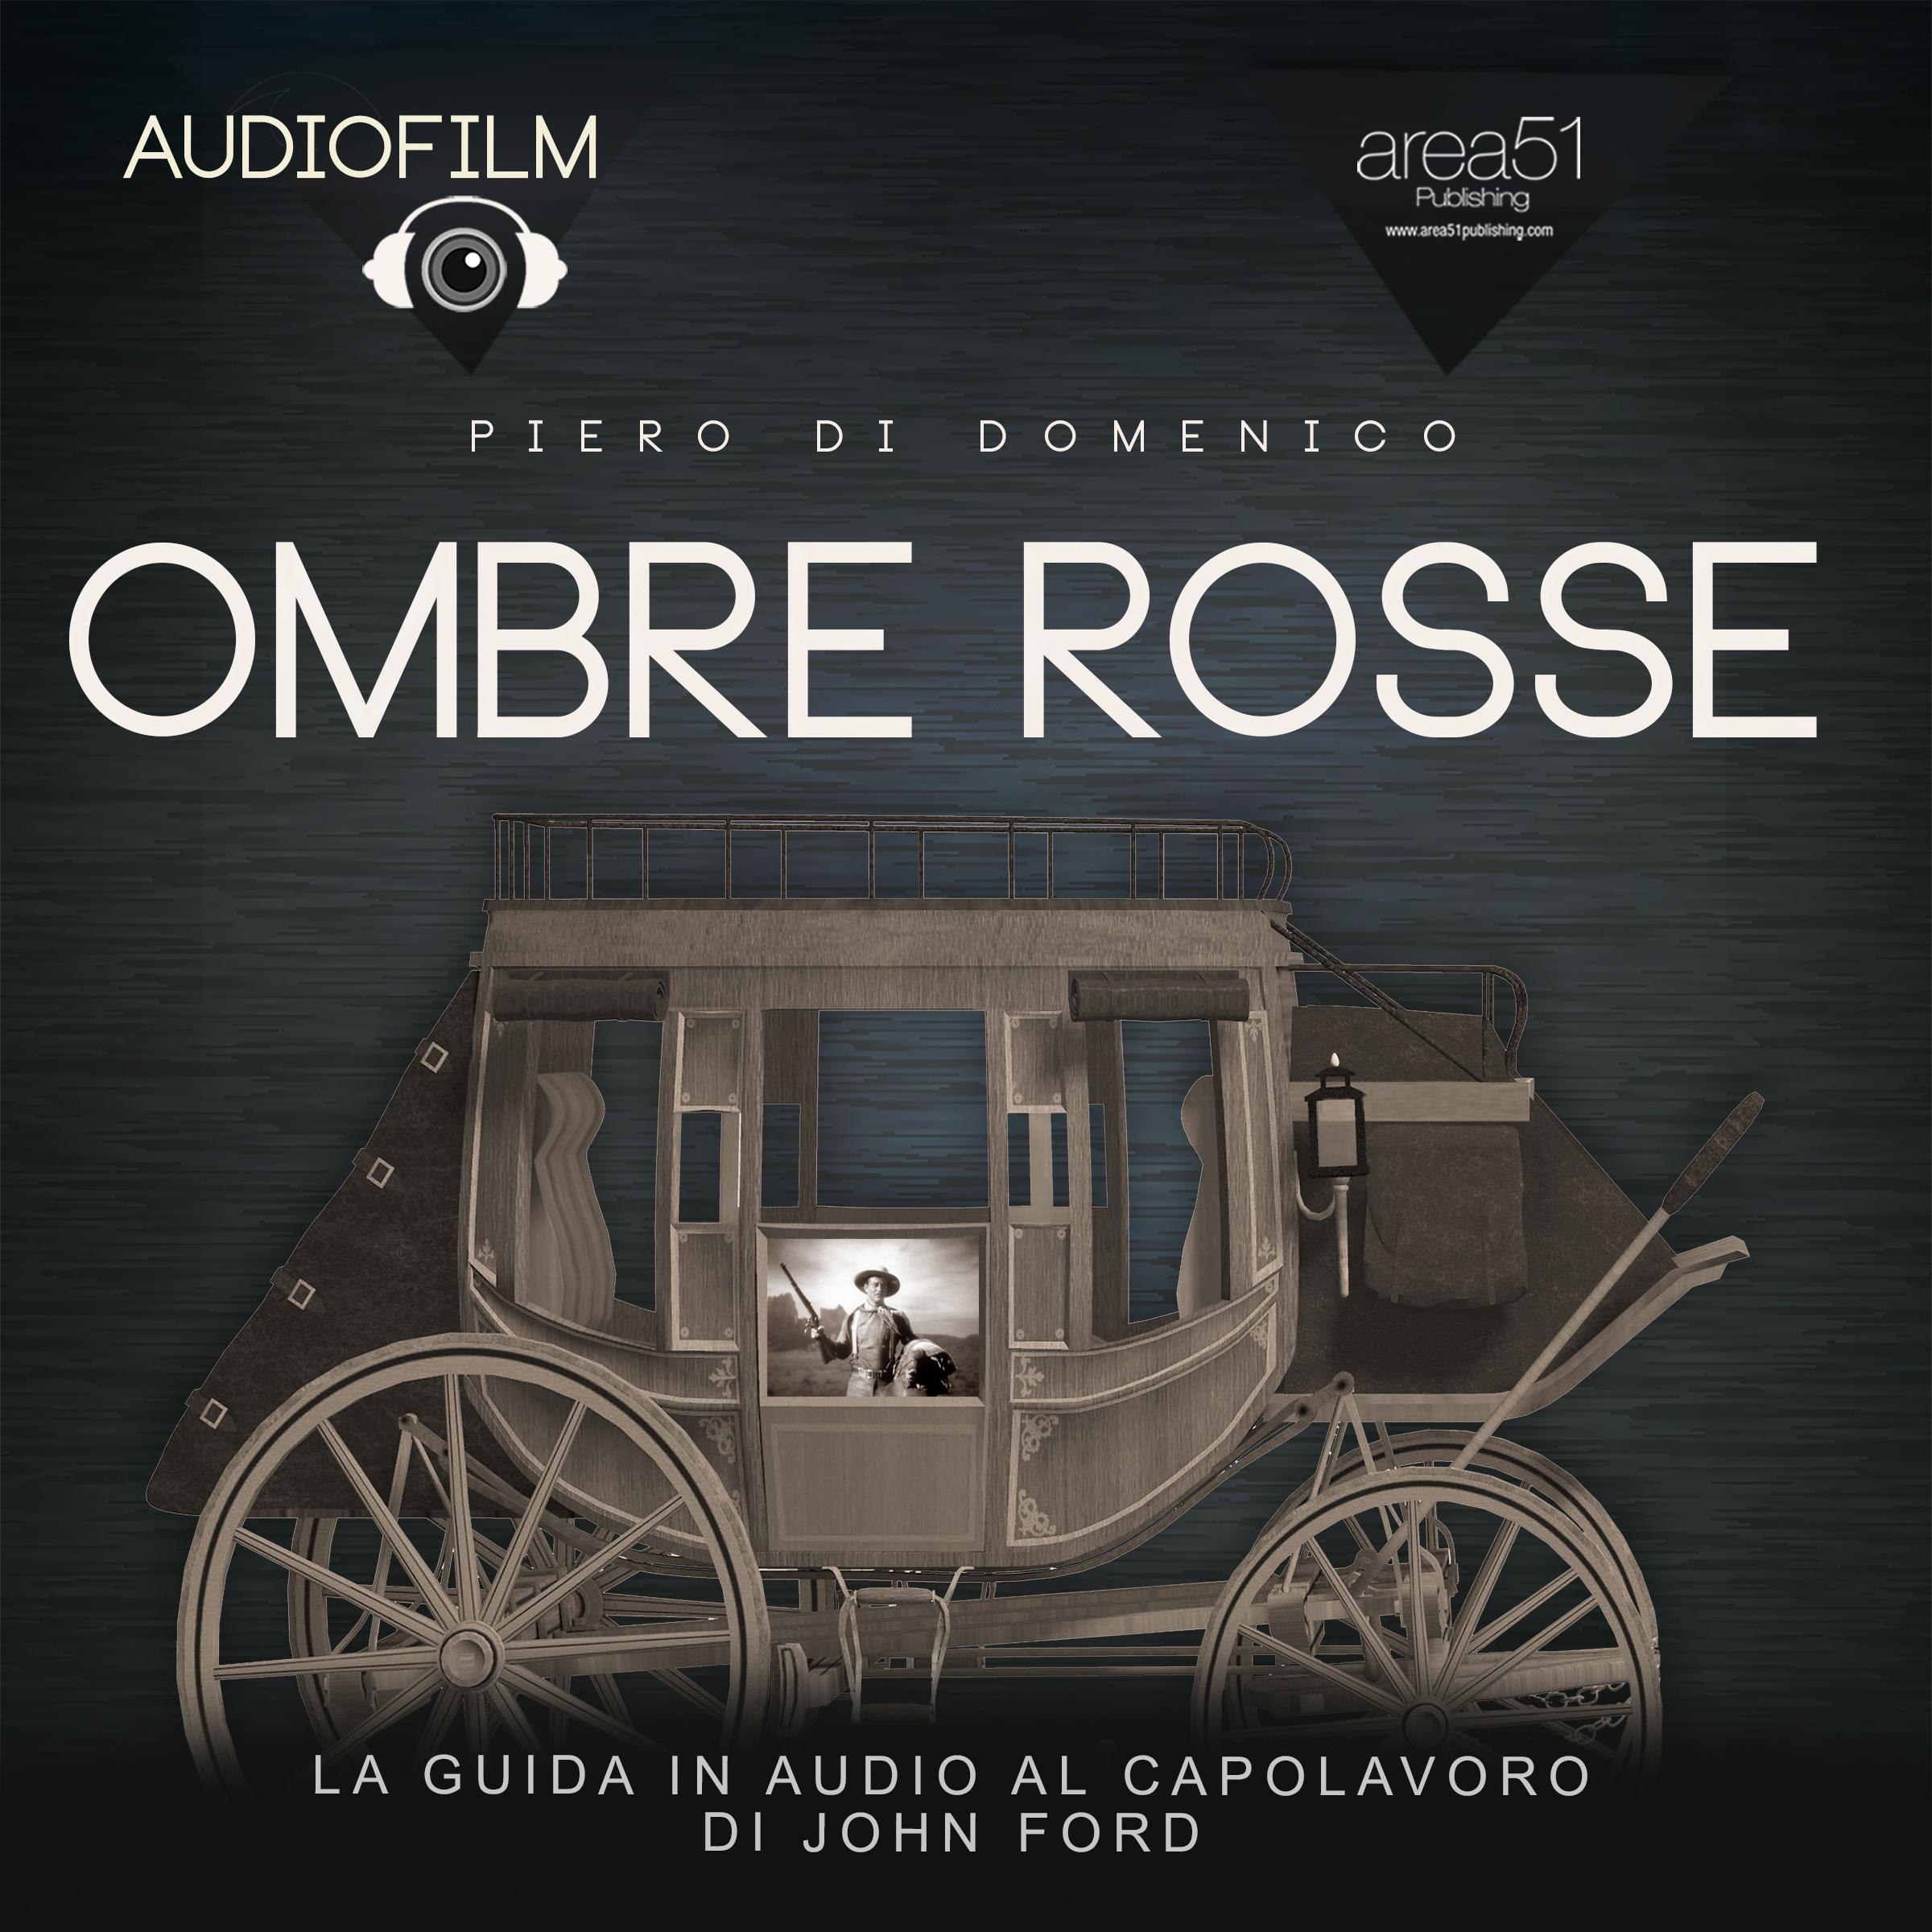 Ombre Rosse. Audiofilm-0